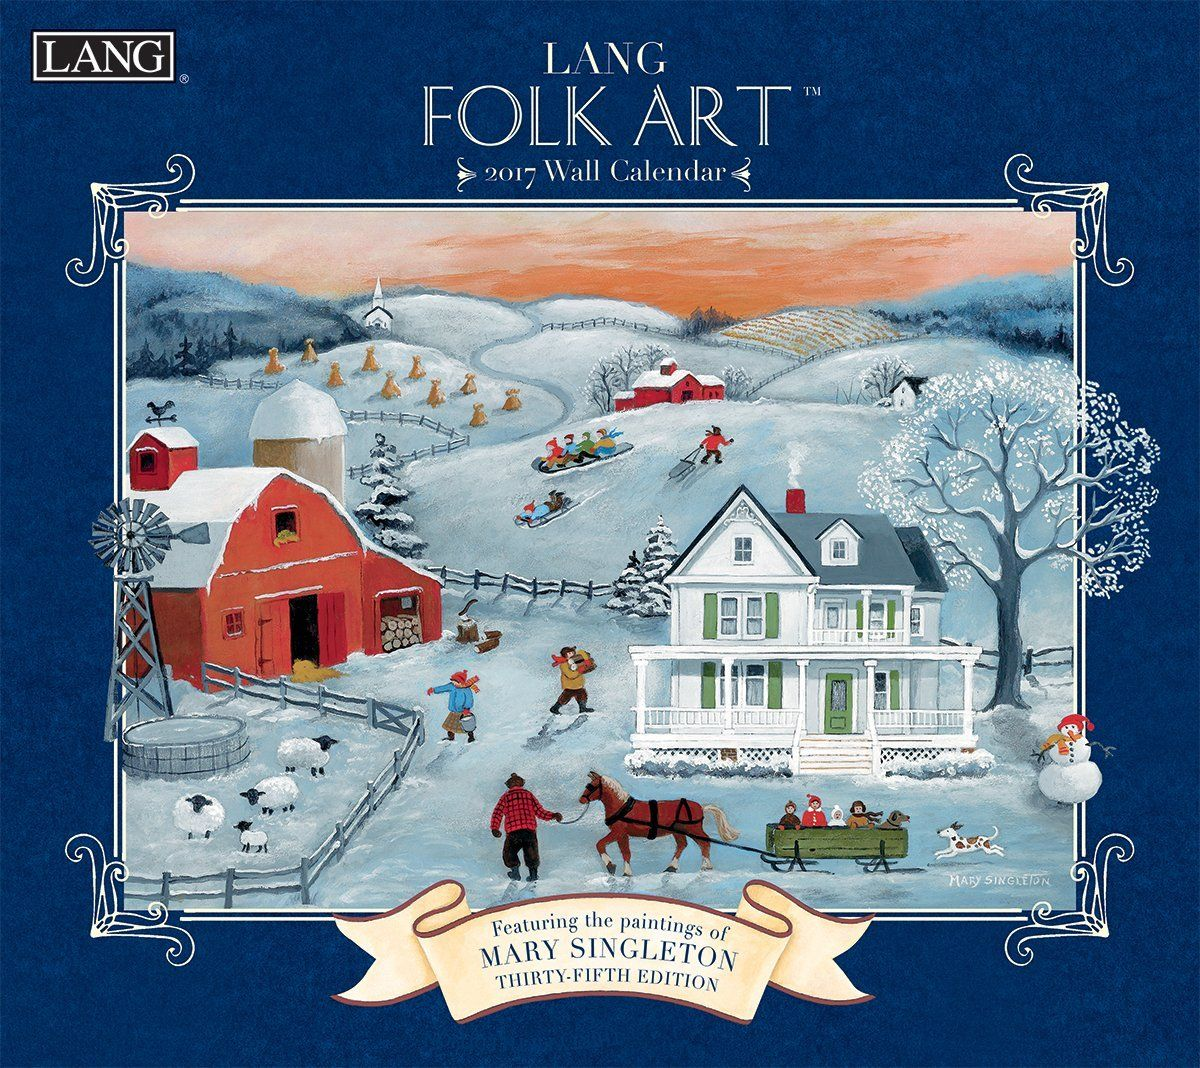 Amazon.com : Lang 2017 Lang Folk Art Wall Calendar, 13.375 x 24 inches (17991001922) : Office Products